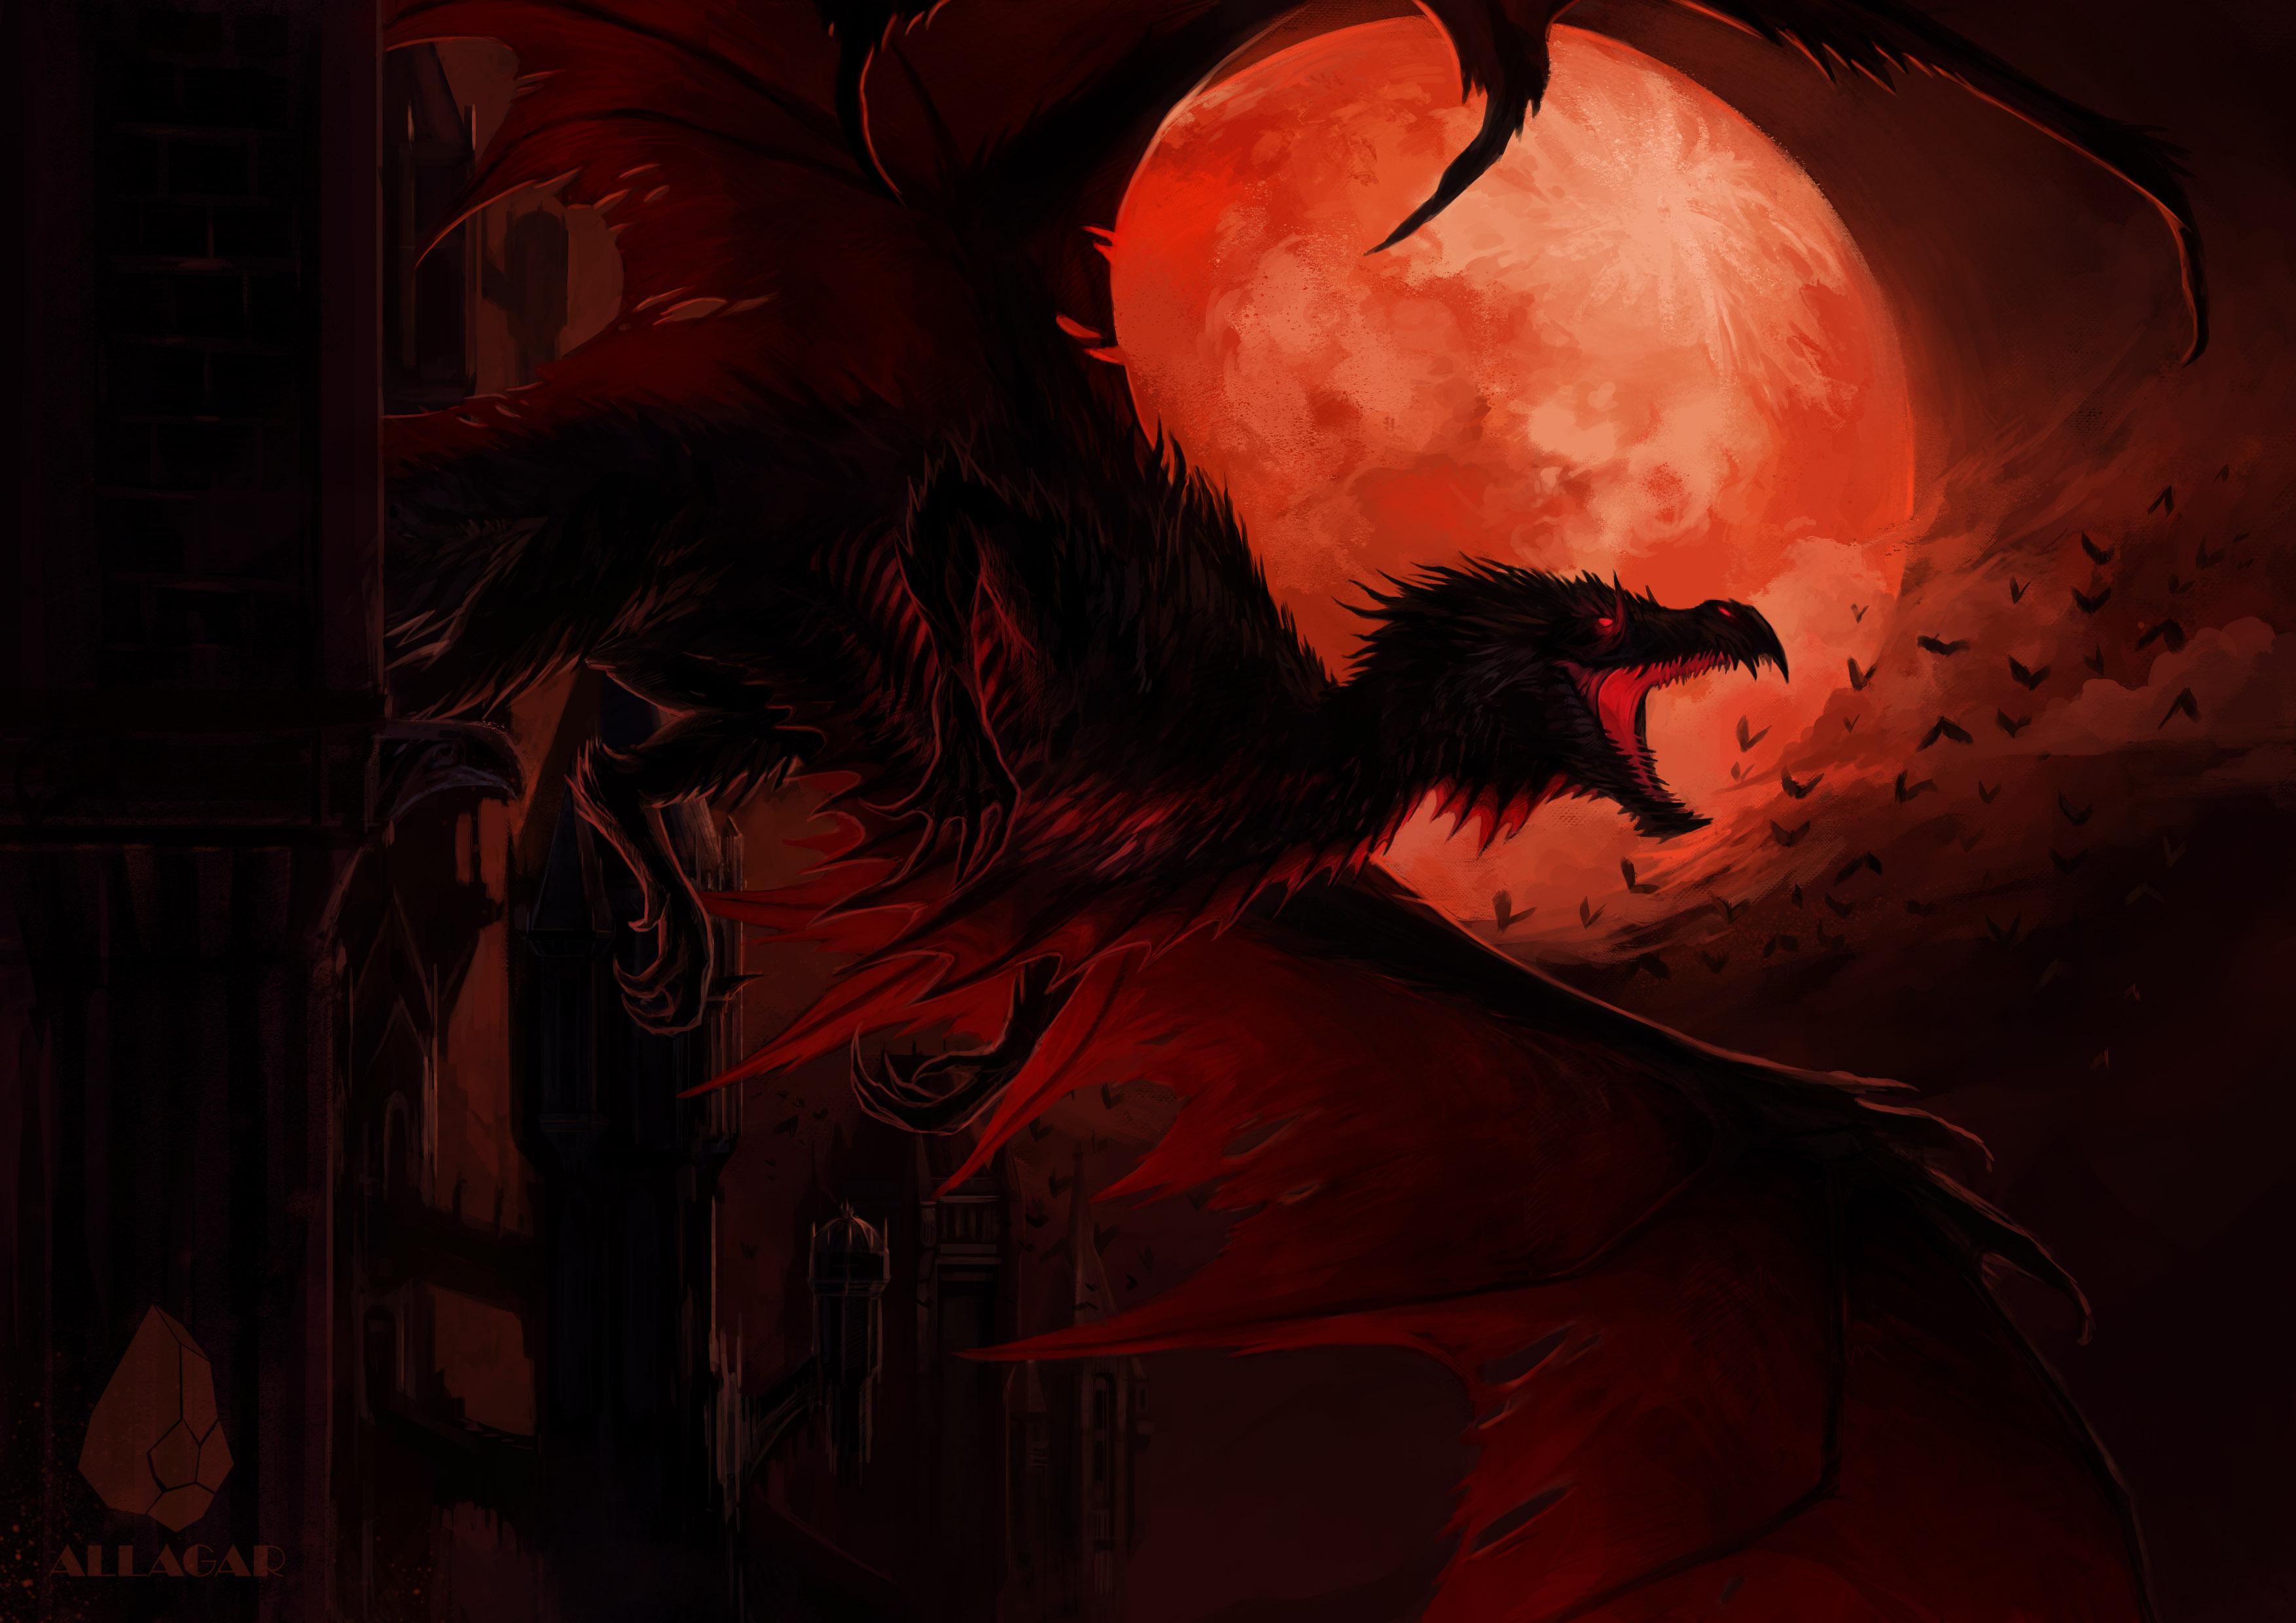 1336x768 Dragon In Dark Night 4k Laptop Hd Hd 4k Wallpapers